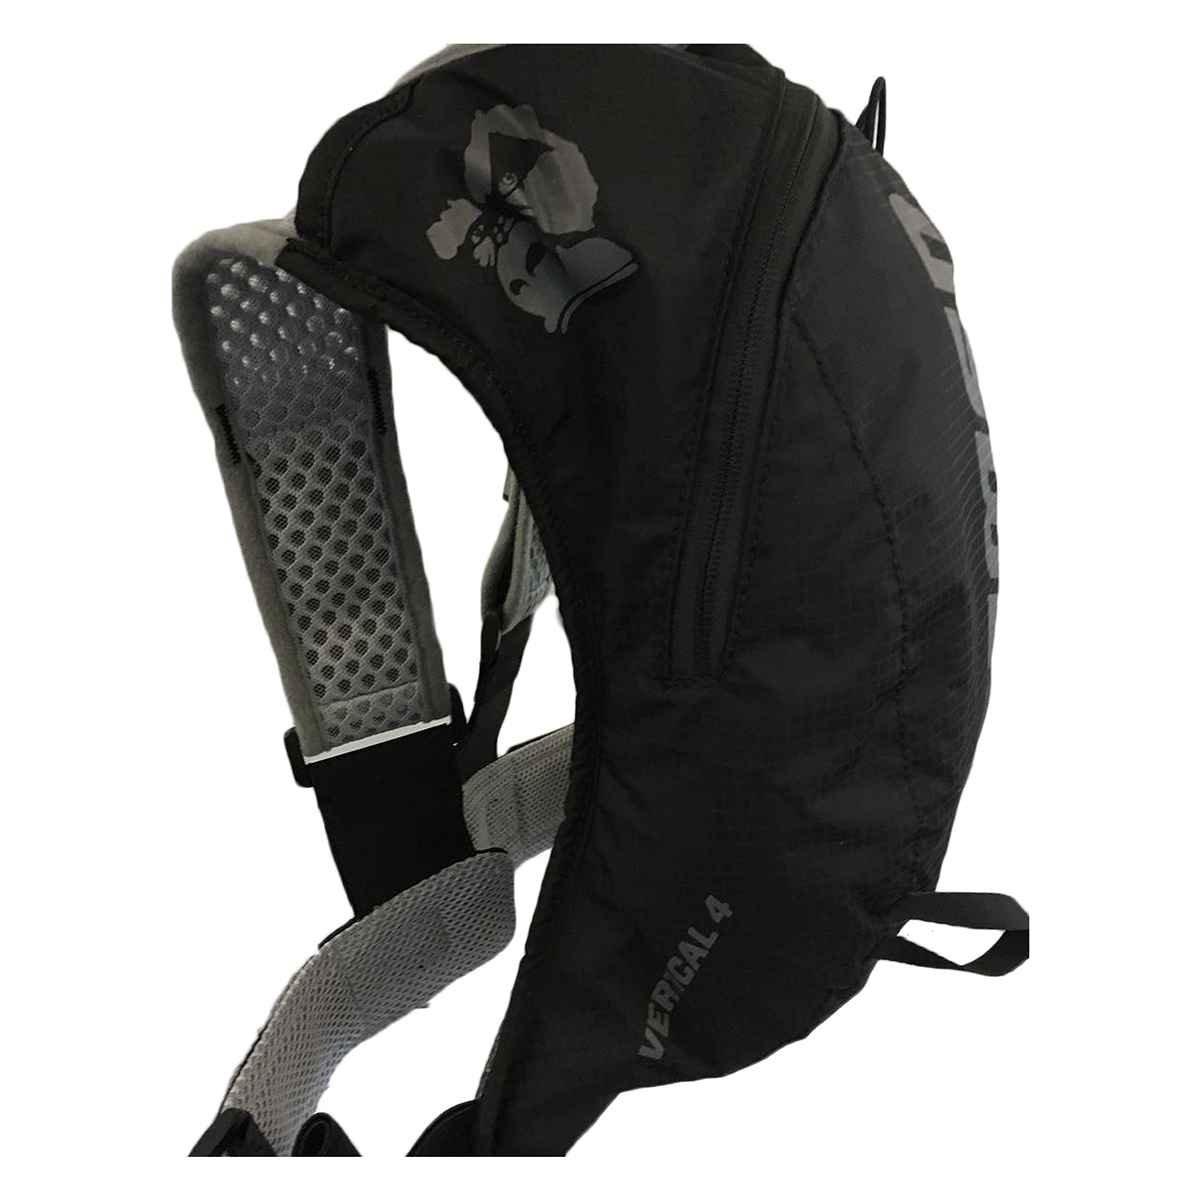 K-2040201 USWE Bag Uswe Hydration Vertical-4 Black